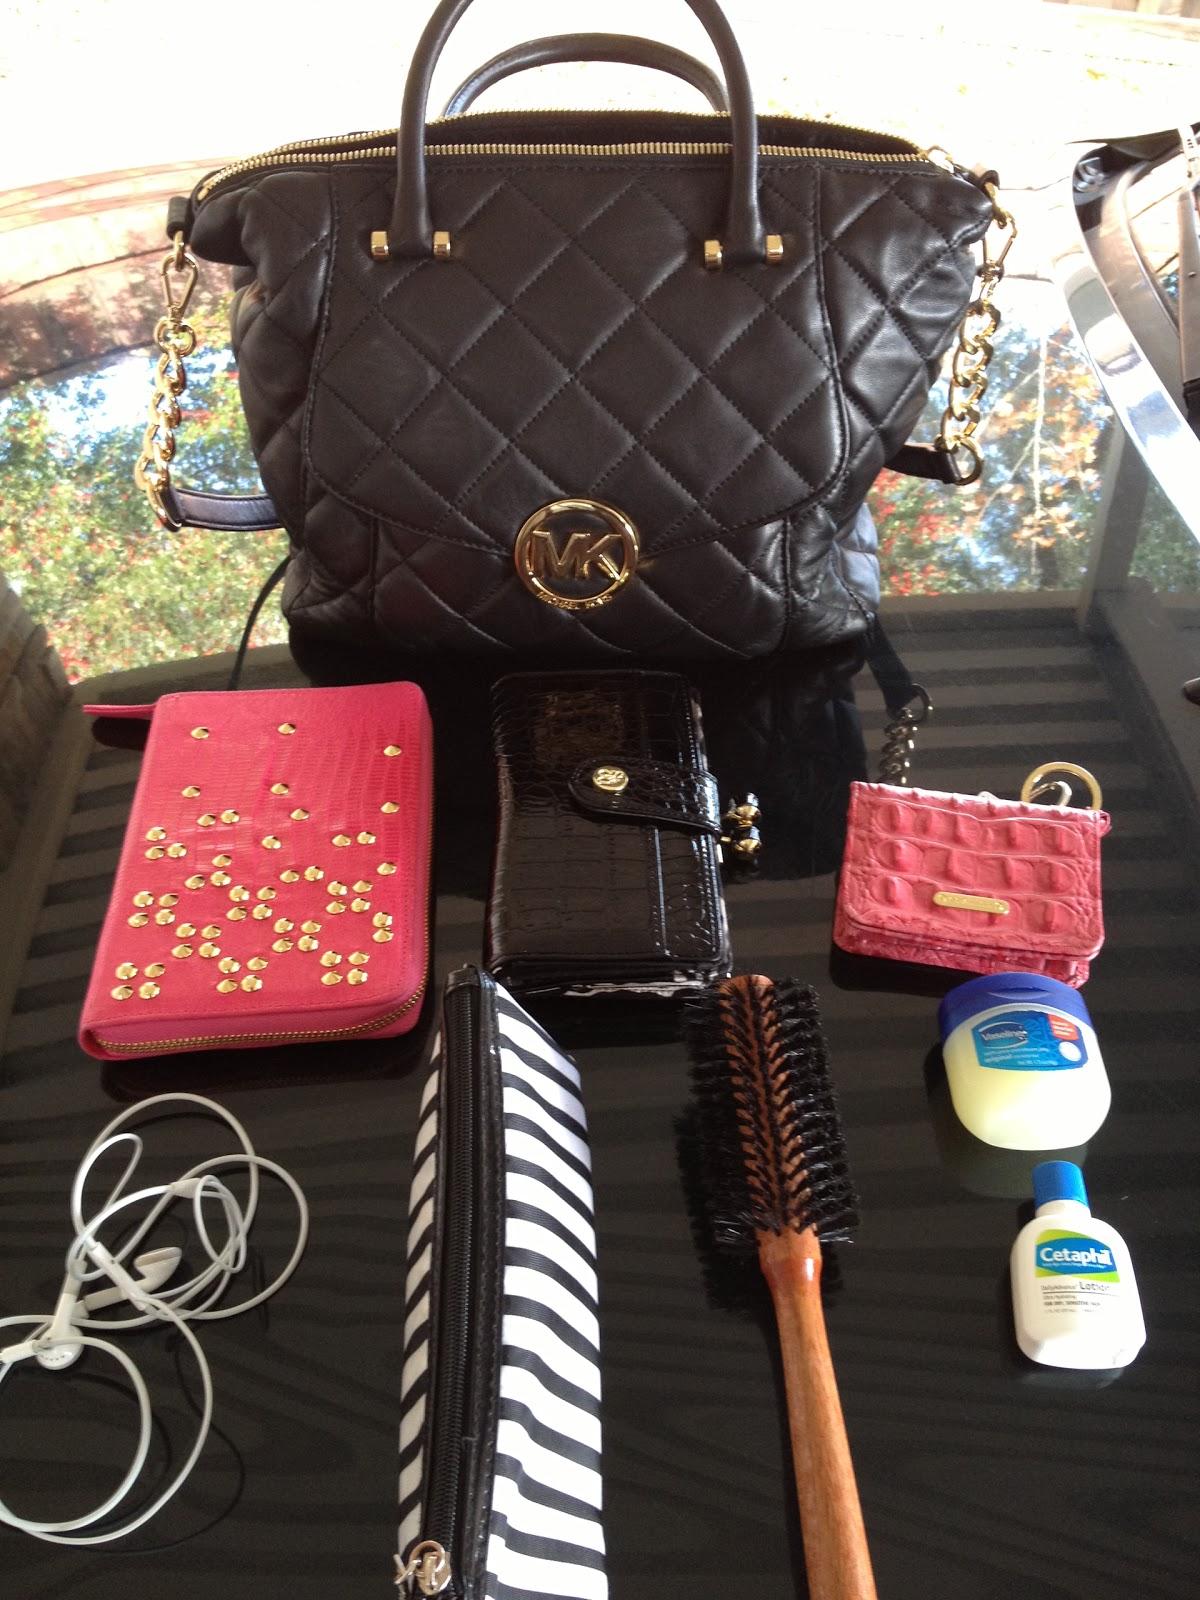 Sale Michael Kors Fulton Satchels - 2013 01 Whats In My Bag